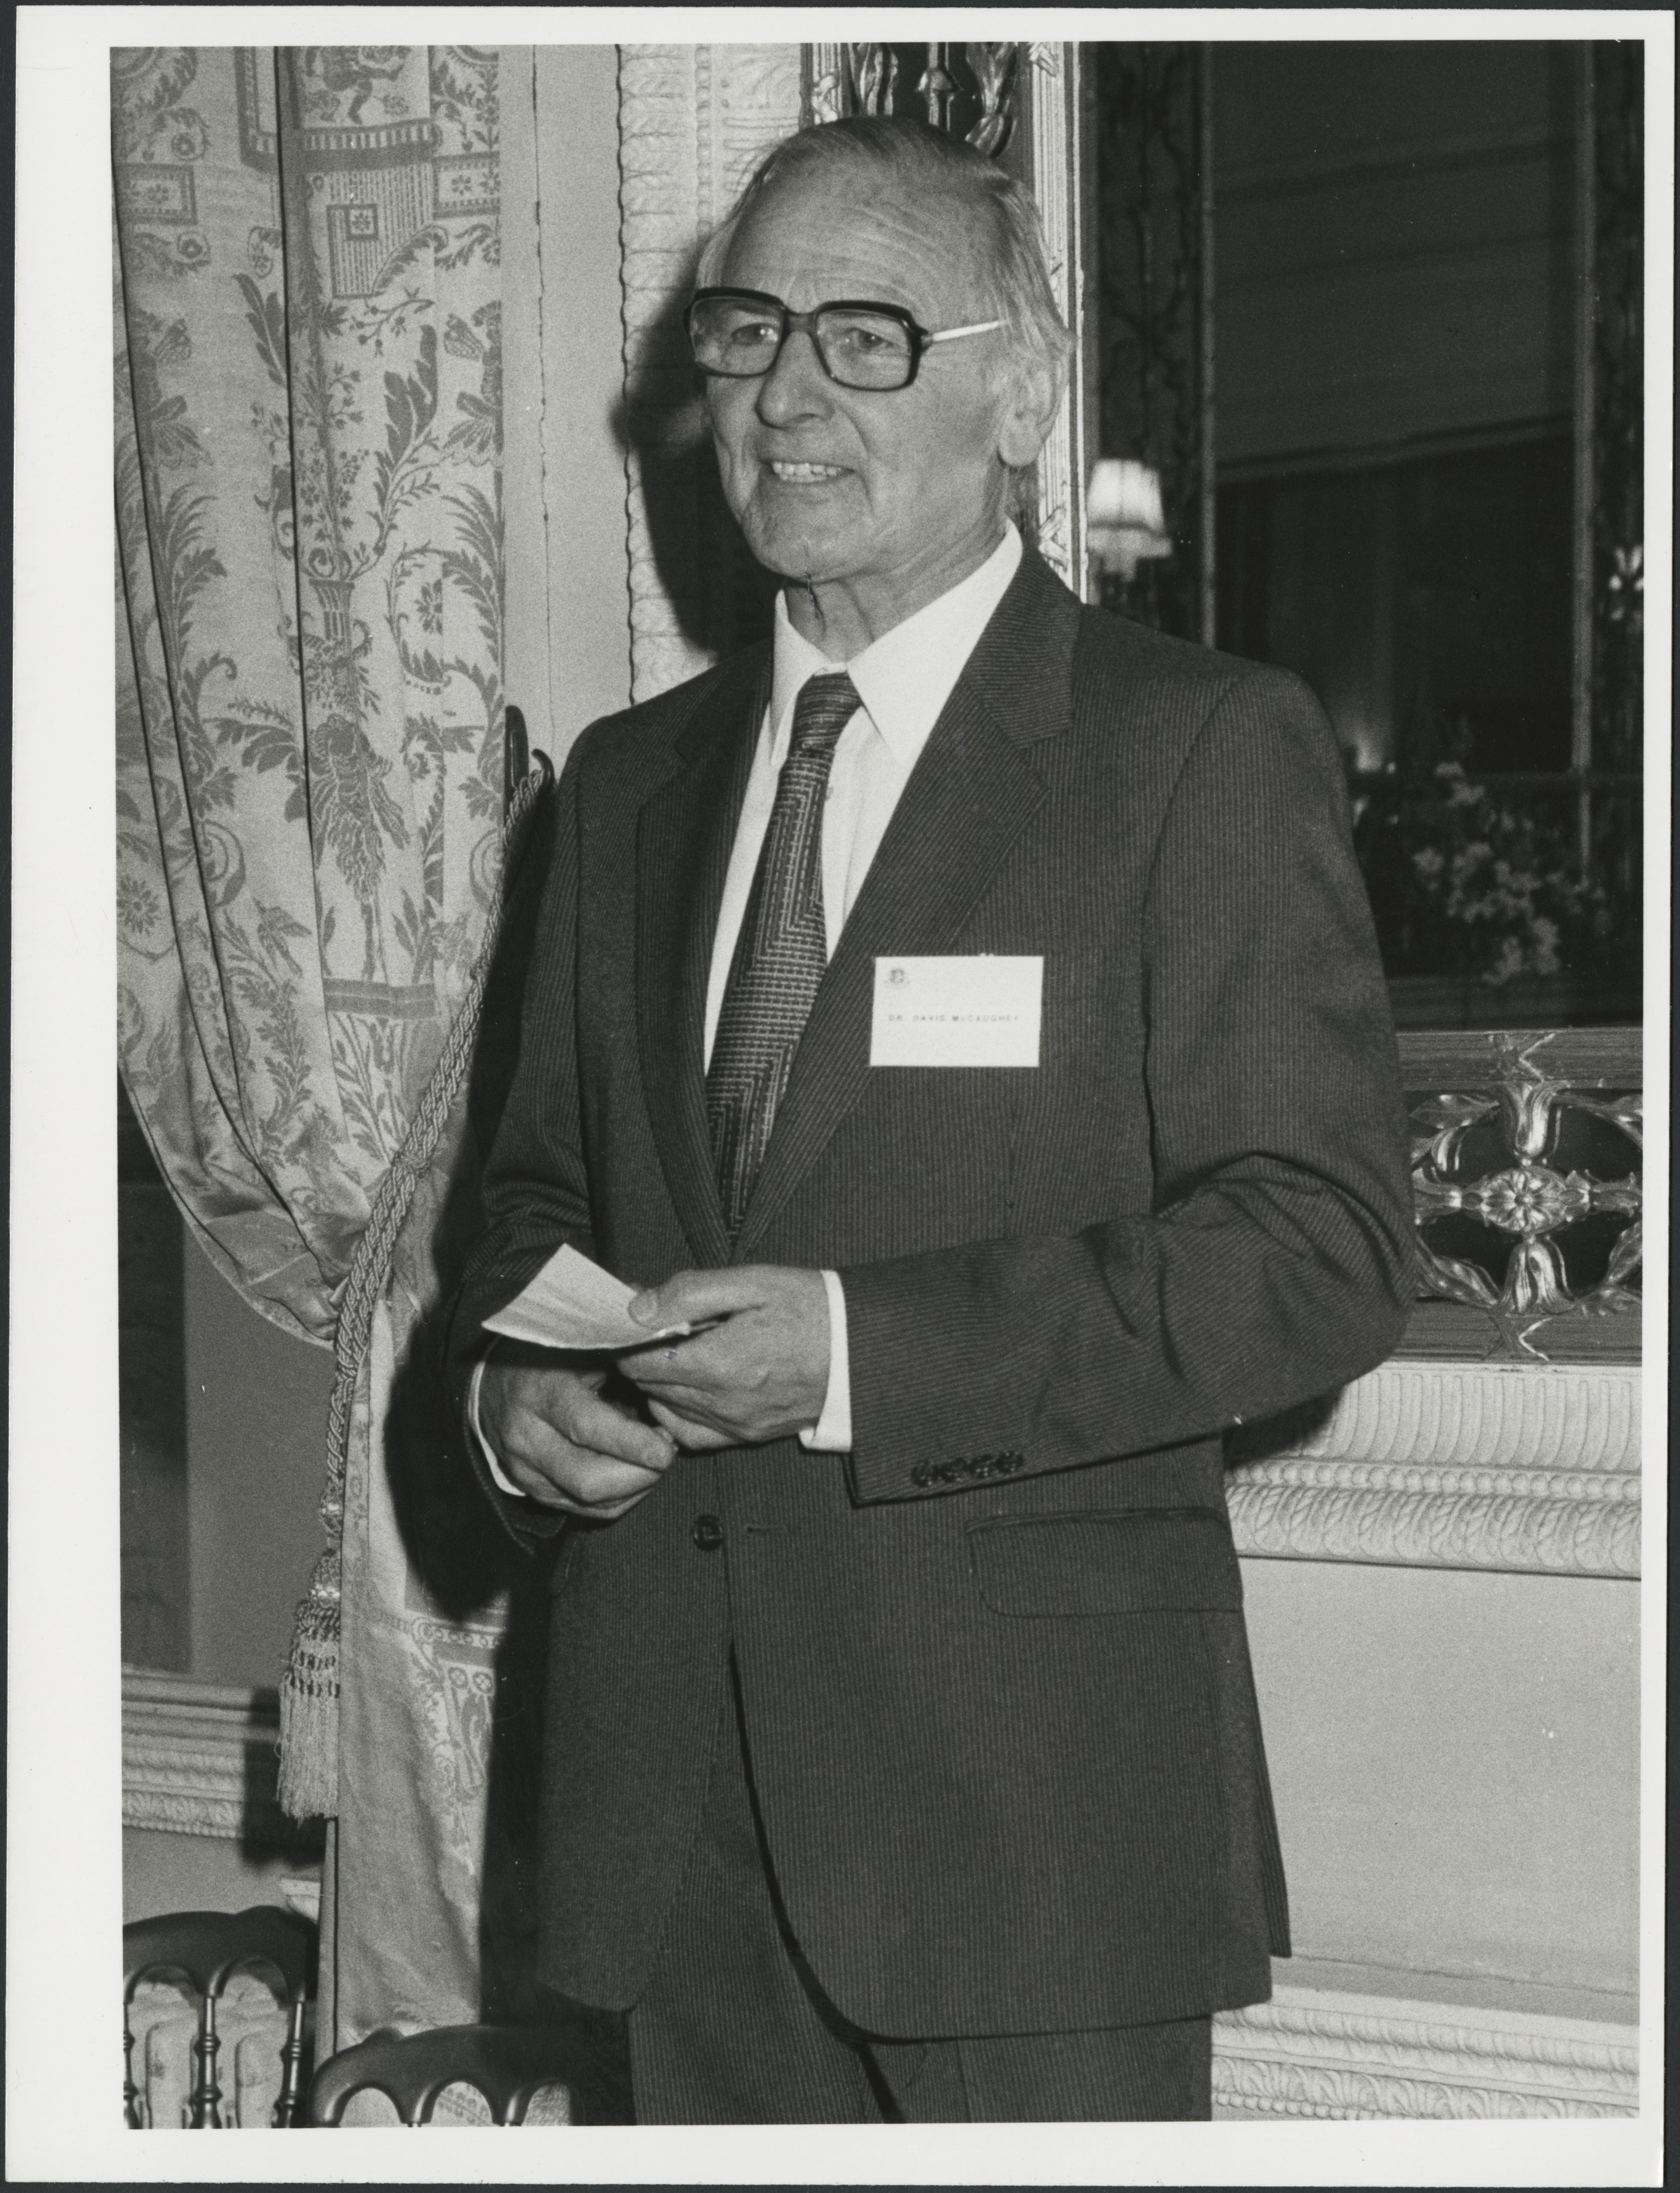 Davis McCaughey was later Deputy Chancellor, 1983